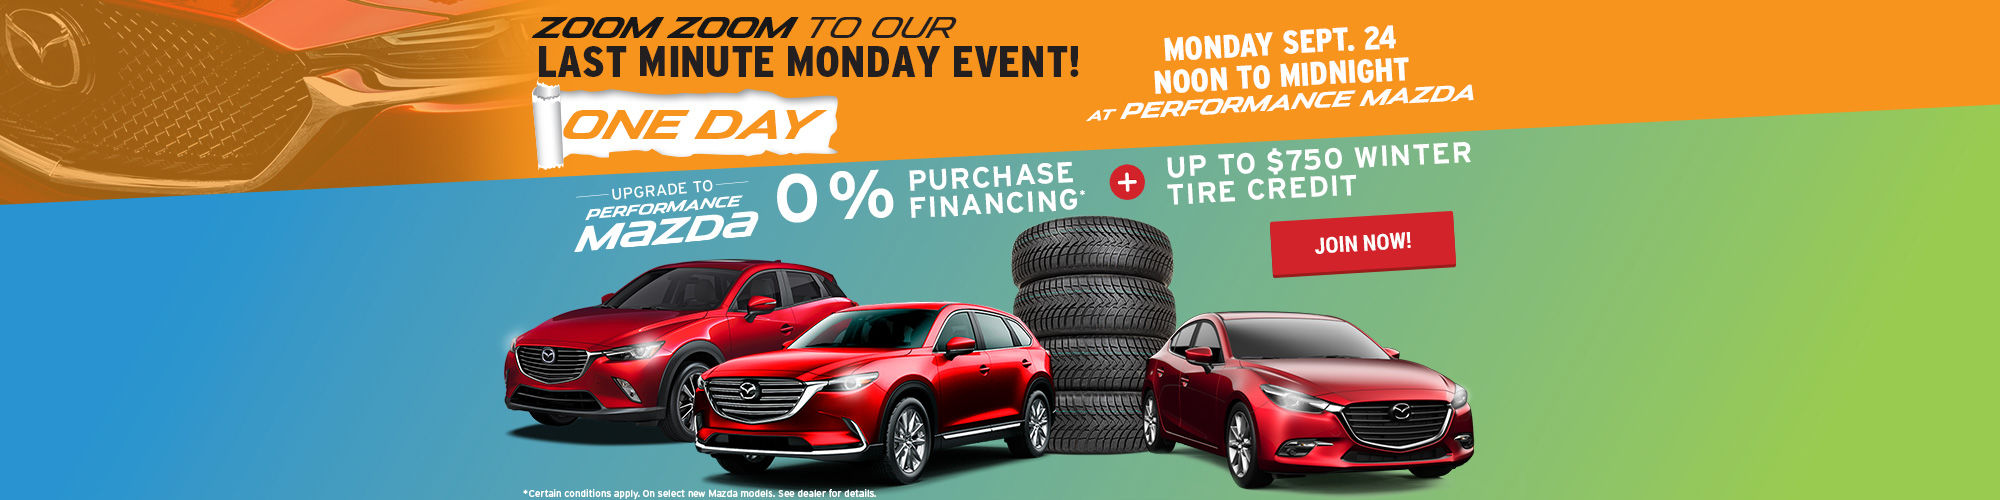 Performance Mazda's Last Minute Monday Sale!